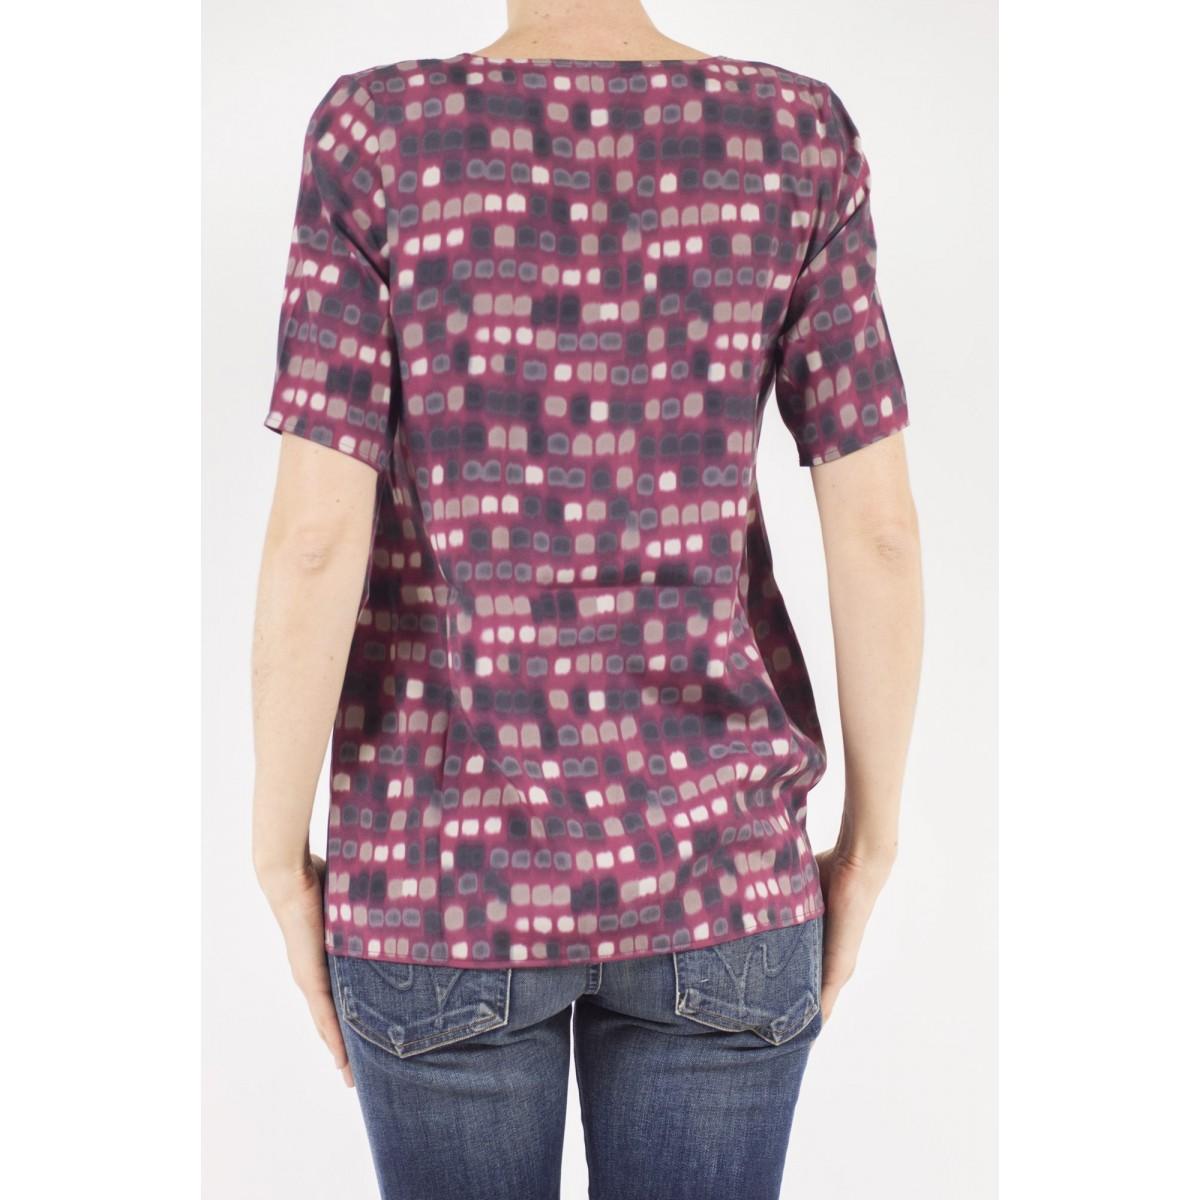 T-shirt donna Kangra - 7825/01 t-shirt seta stampa 207 - Bordo